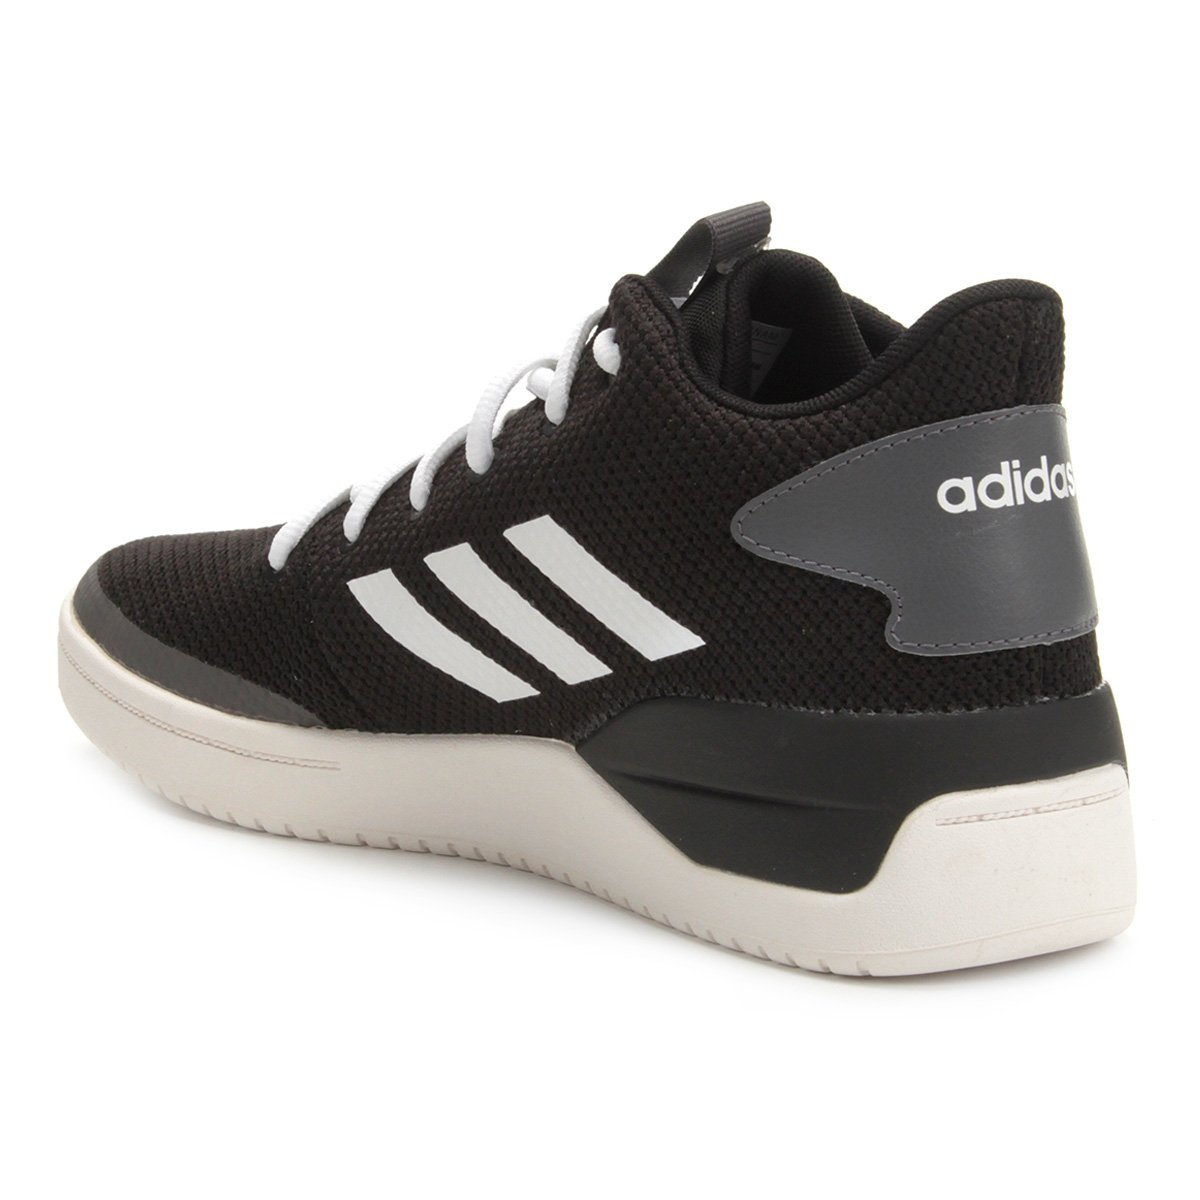 cb0fa8eaf89f0 Tênis Adidas Retro Bball Masculino - Shopping TudoAzul